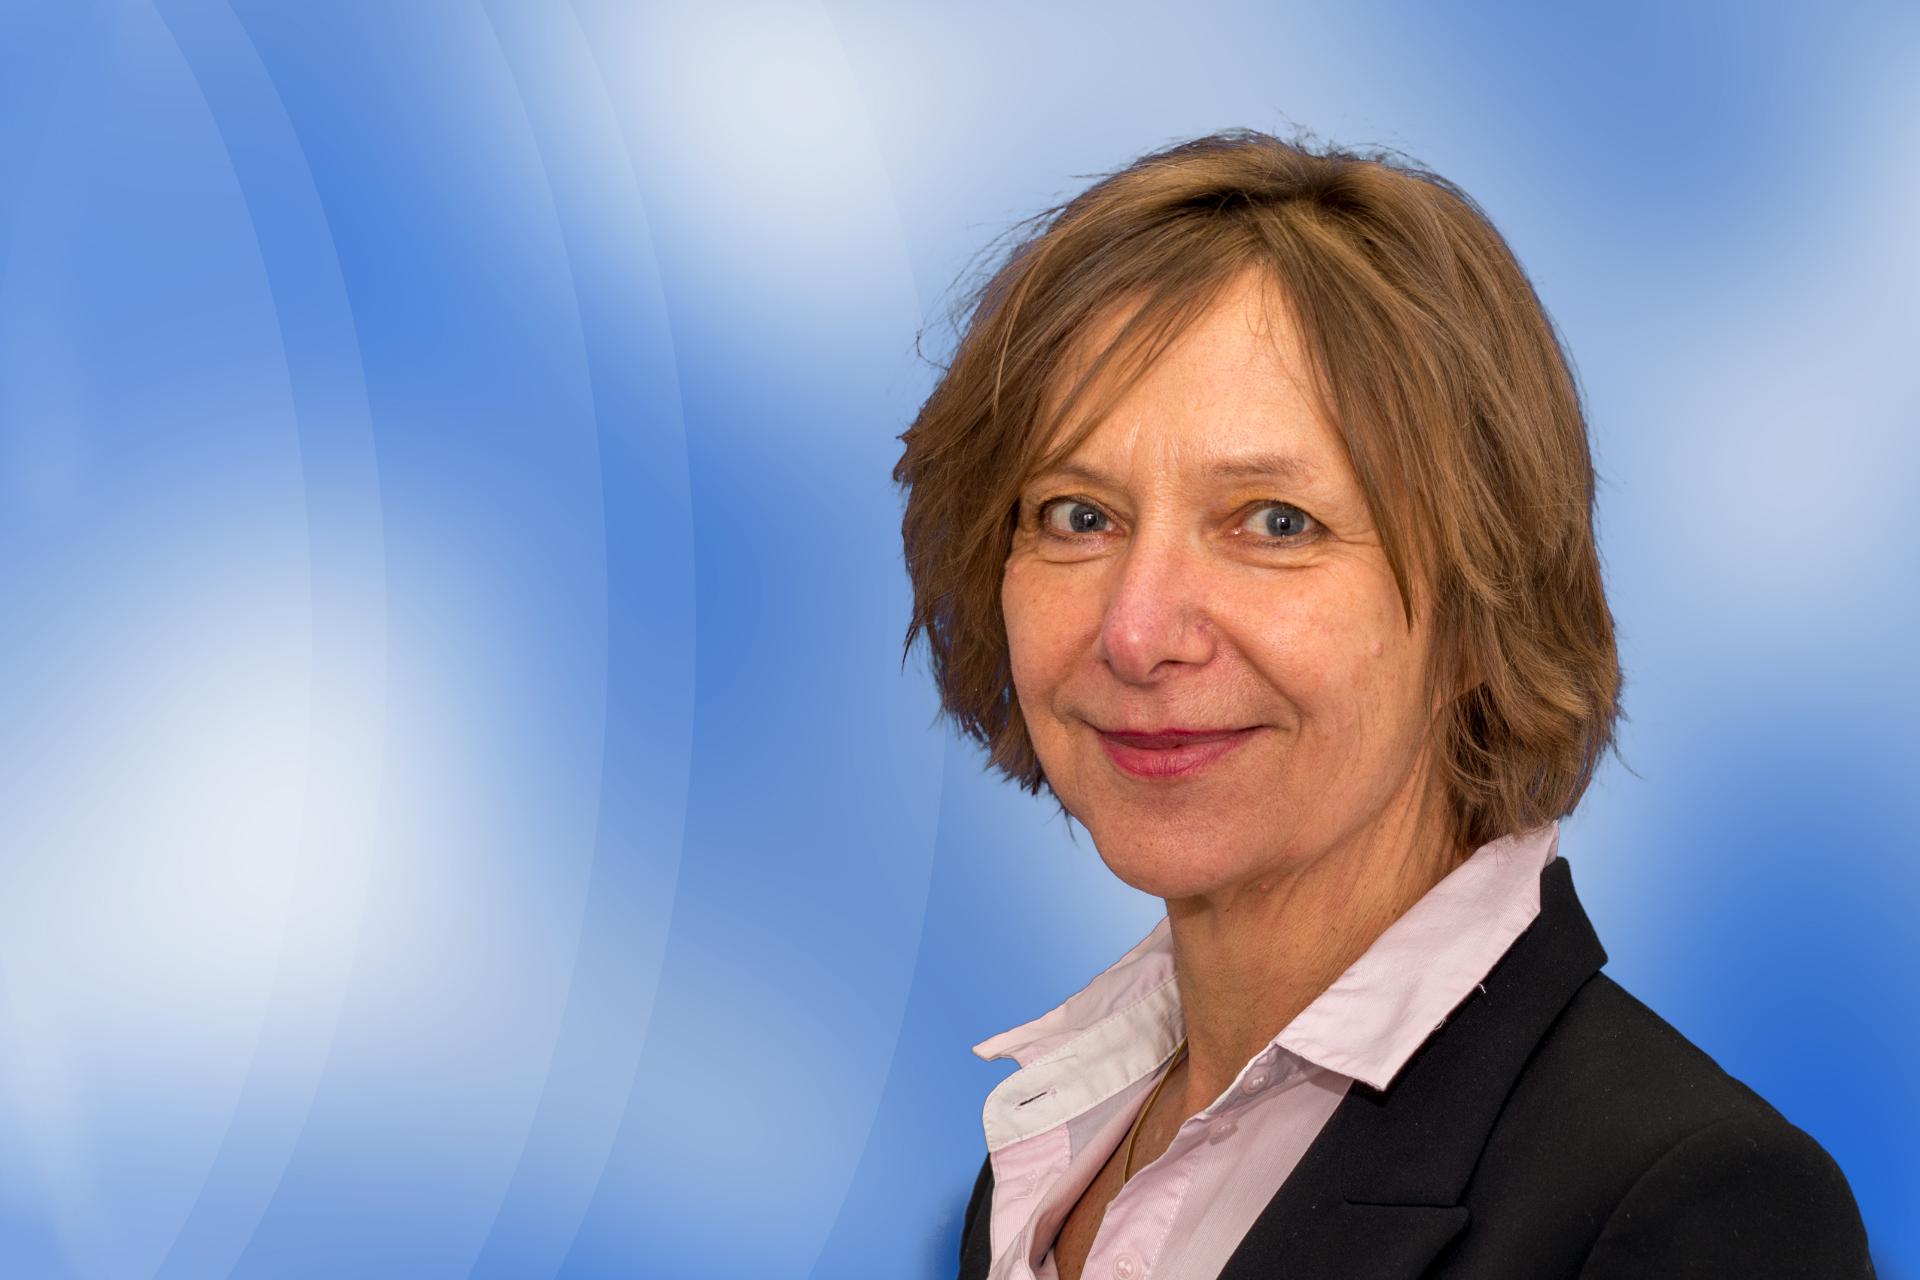 Ingrid Schatter